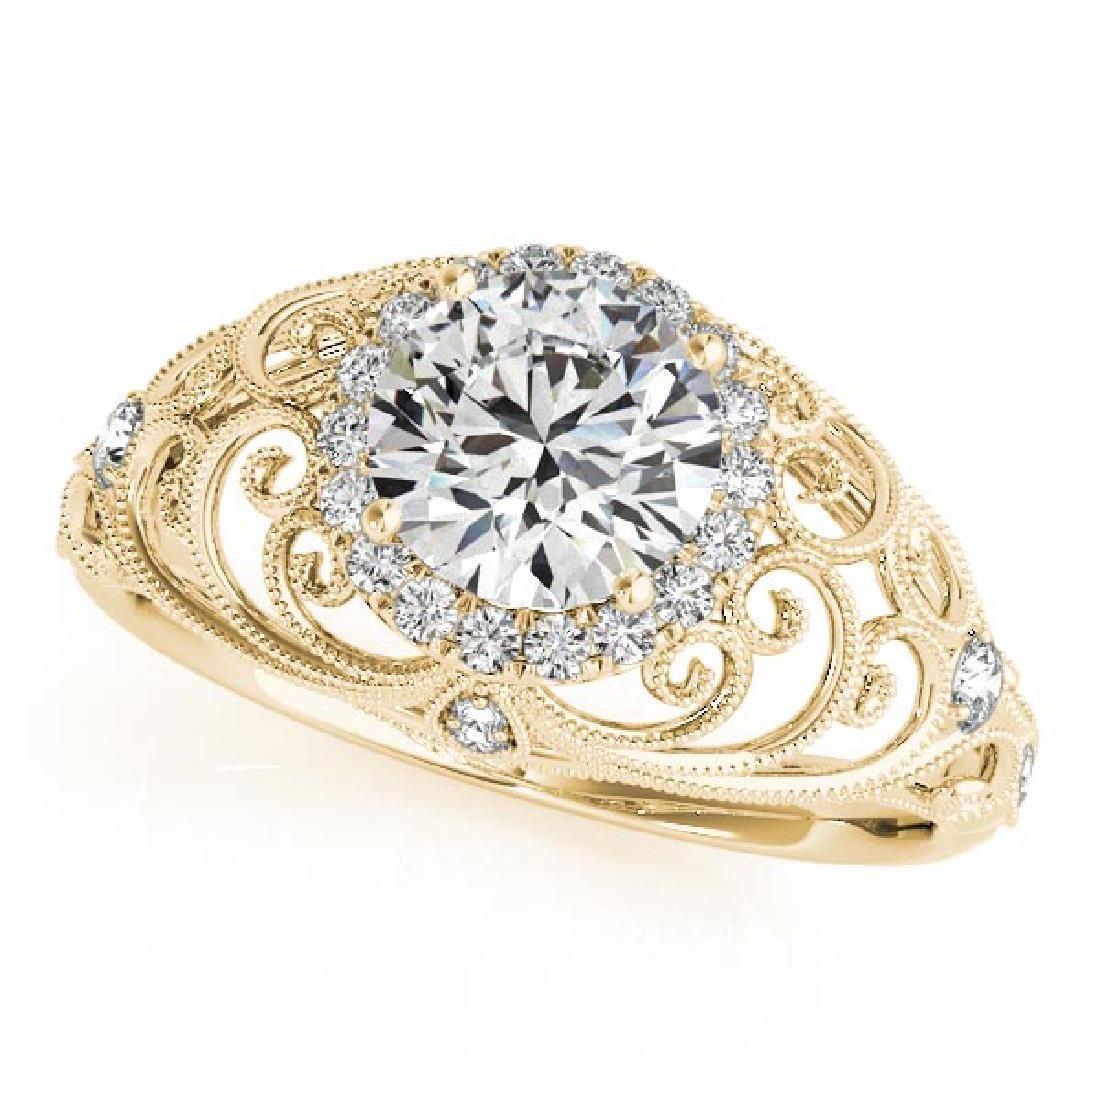 CERTIFIED 18K YELLOW GOLD 1.19 CT G-H/VS-SI1 DIAMOND HA